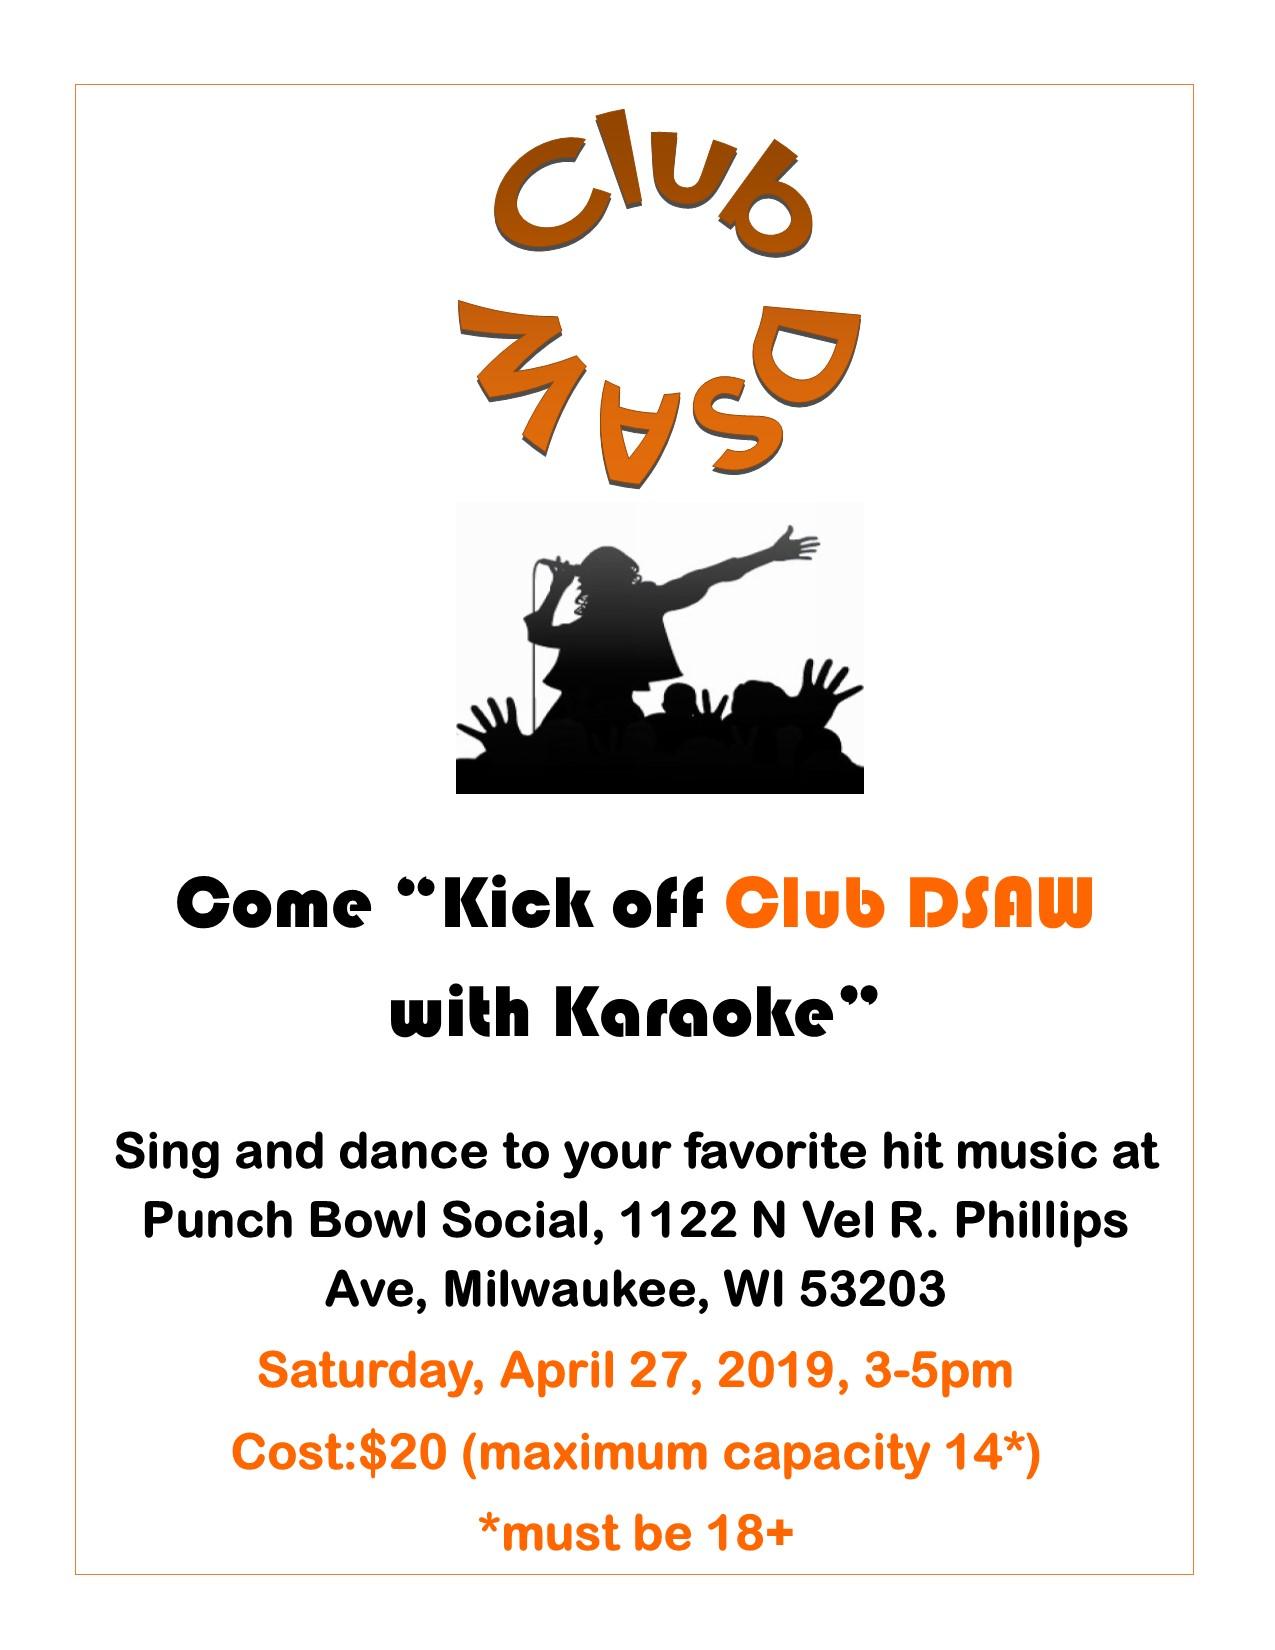 Club DSAW Karaoke April 27, 2019.jpg